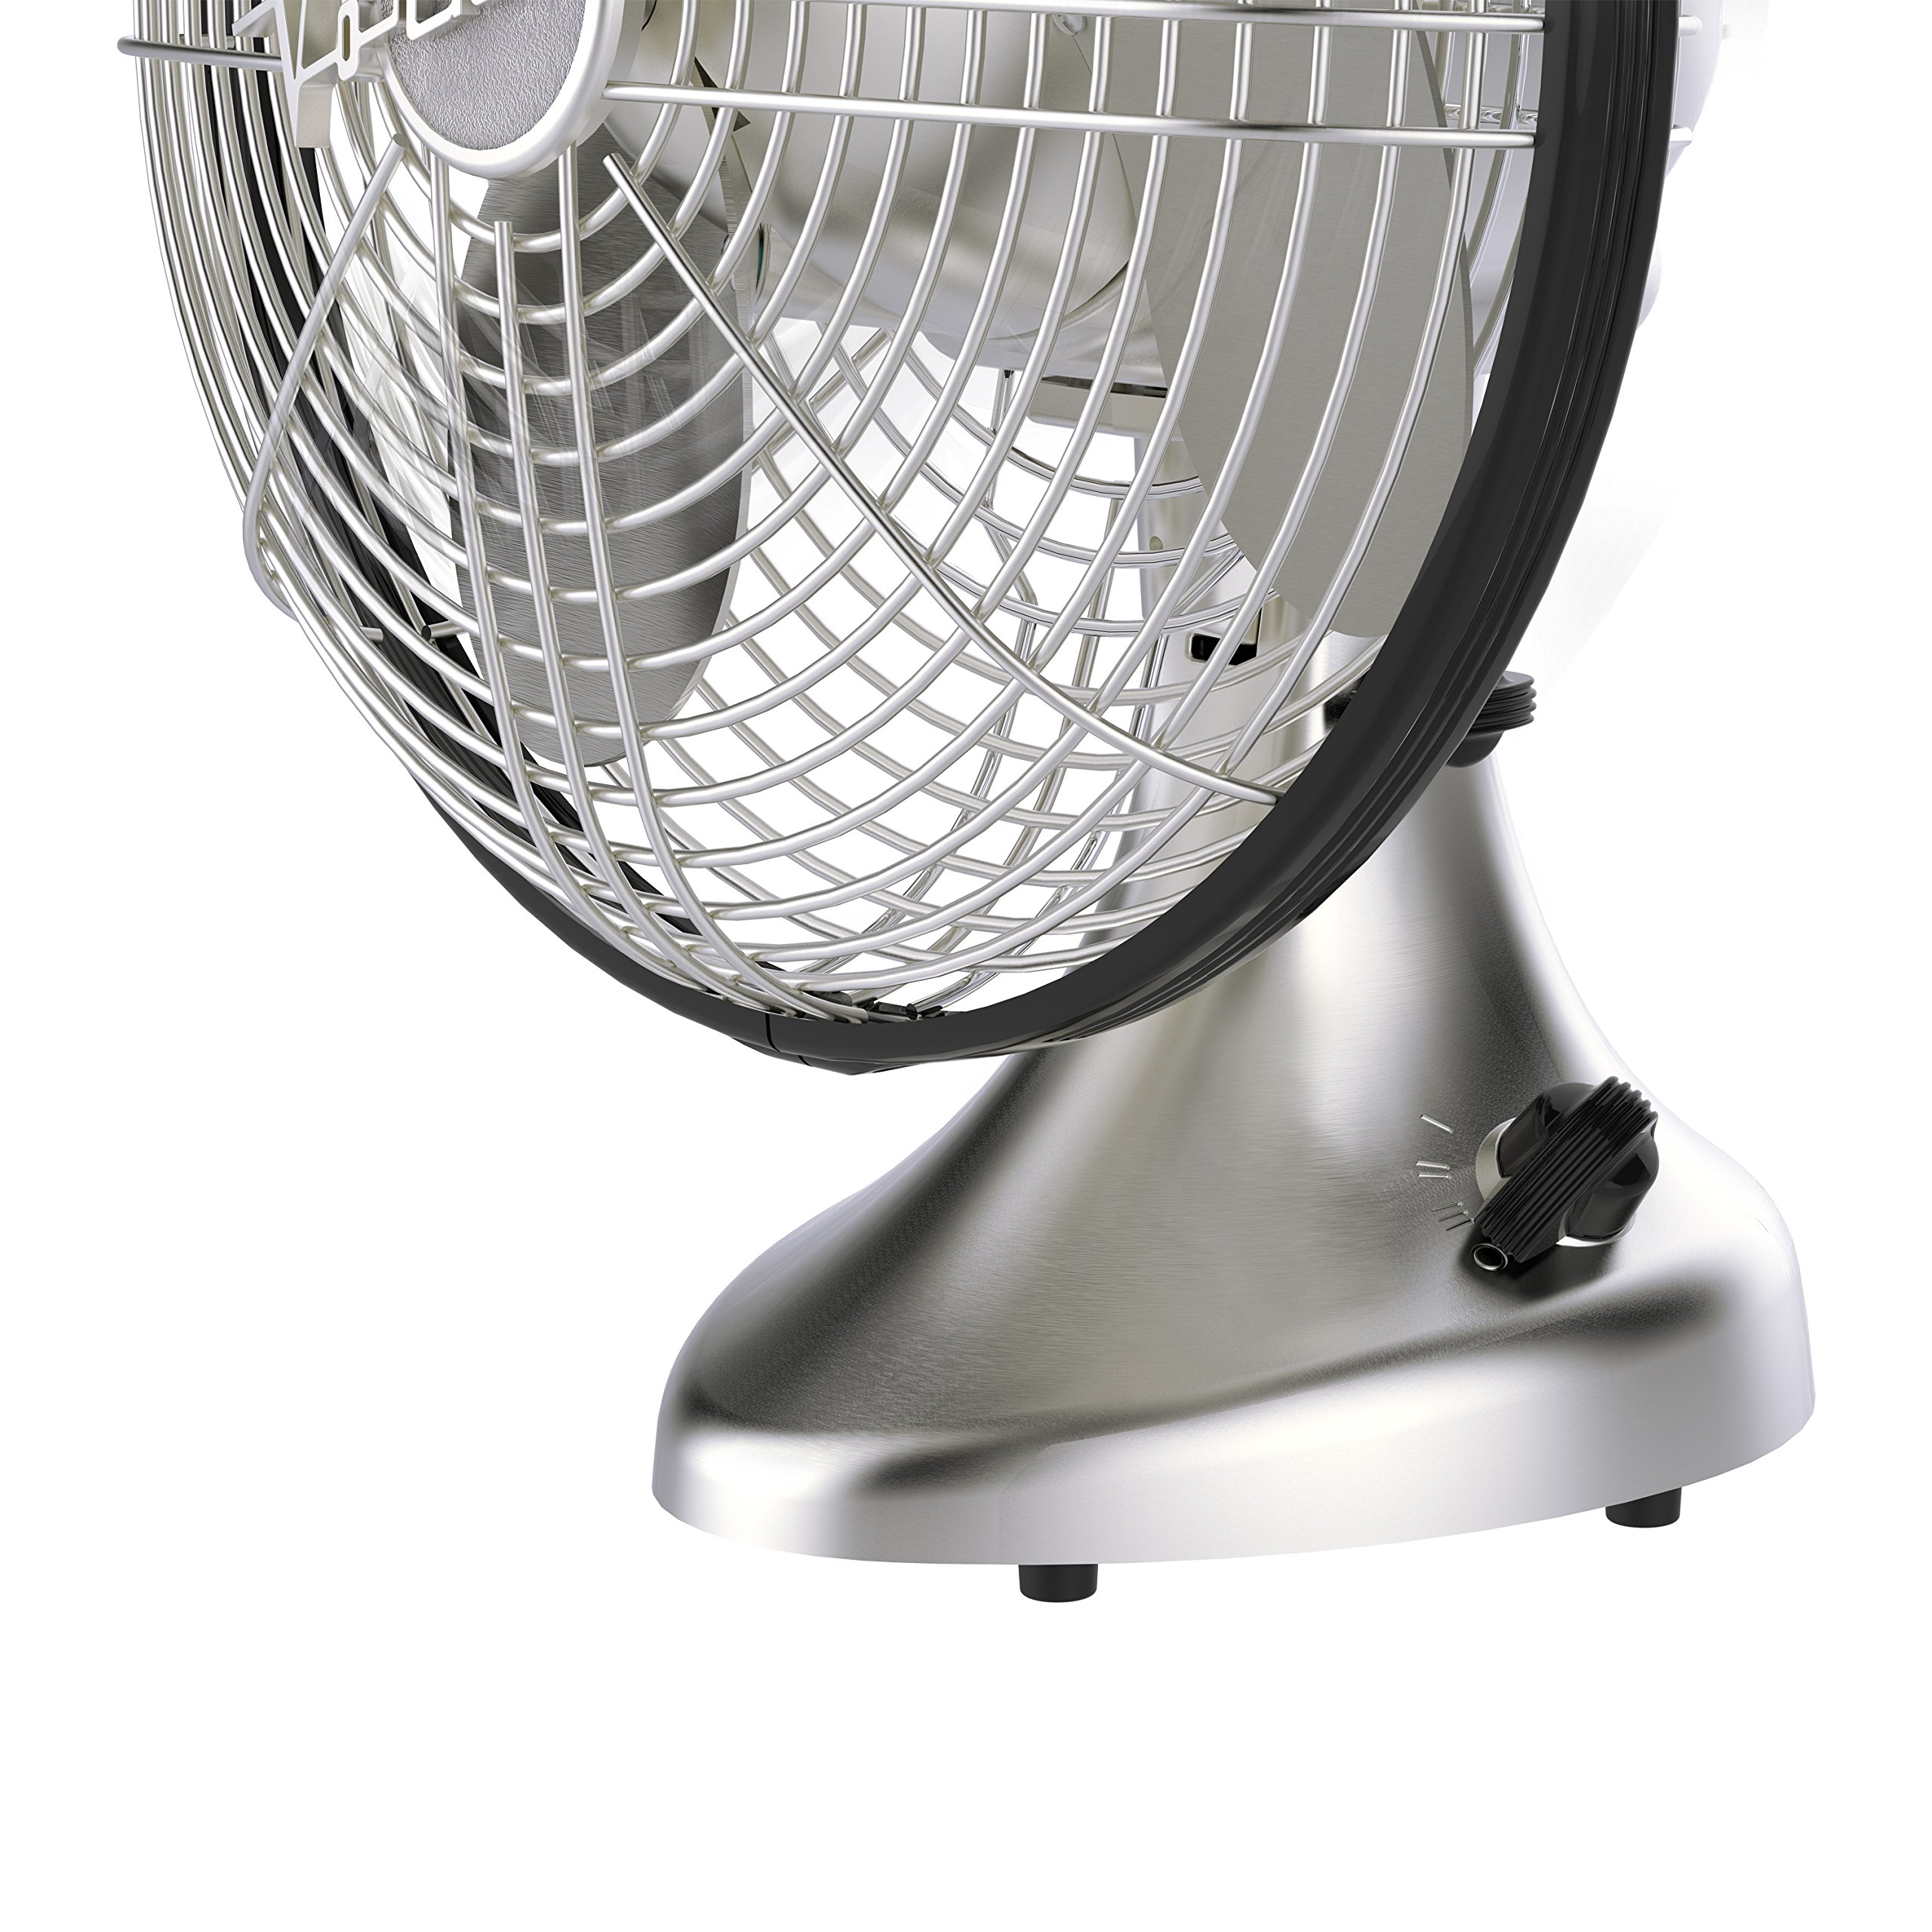 Vornado Silver Swan S Small Room Oscillating Fan Brushed